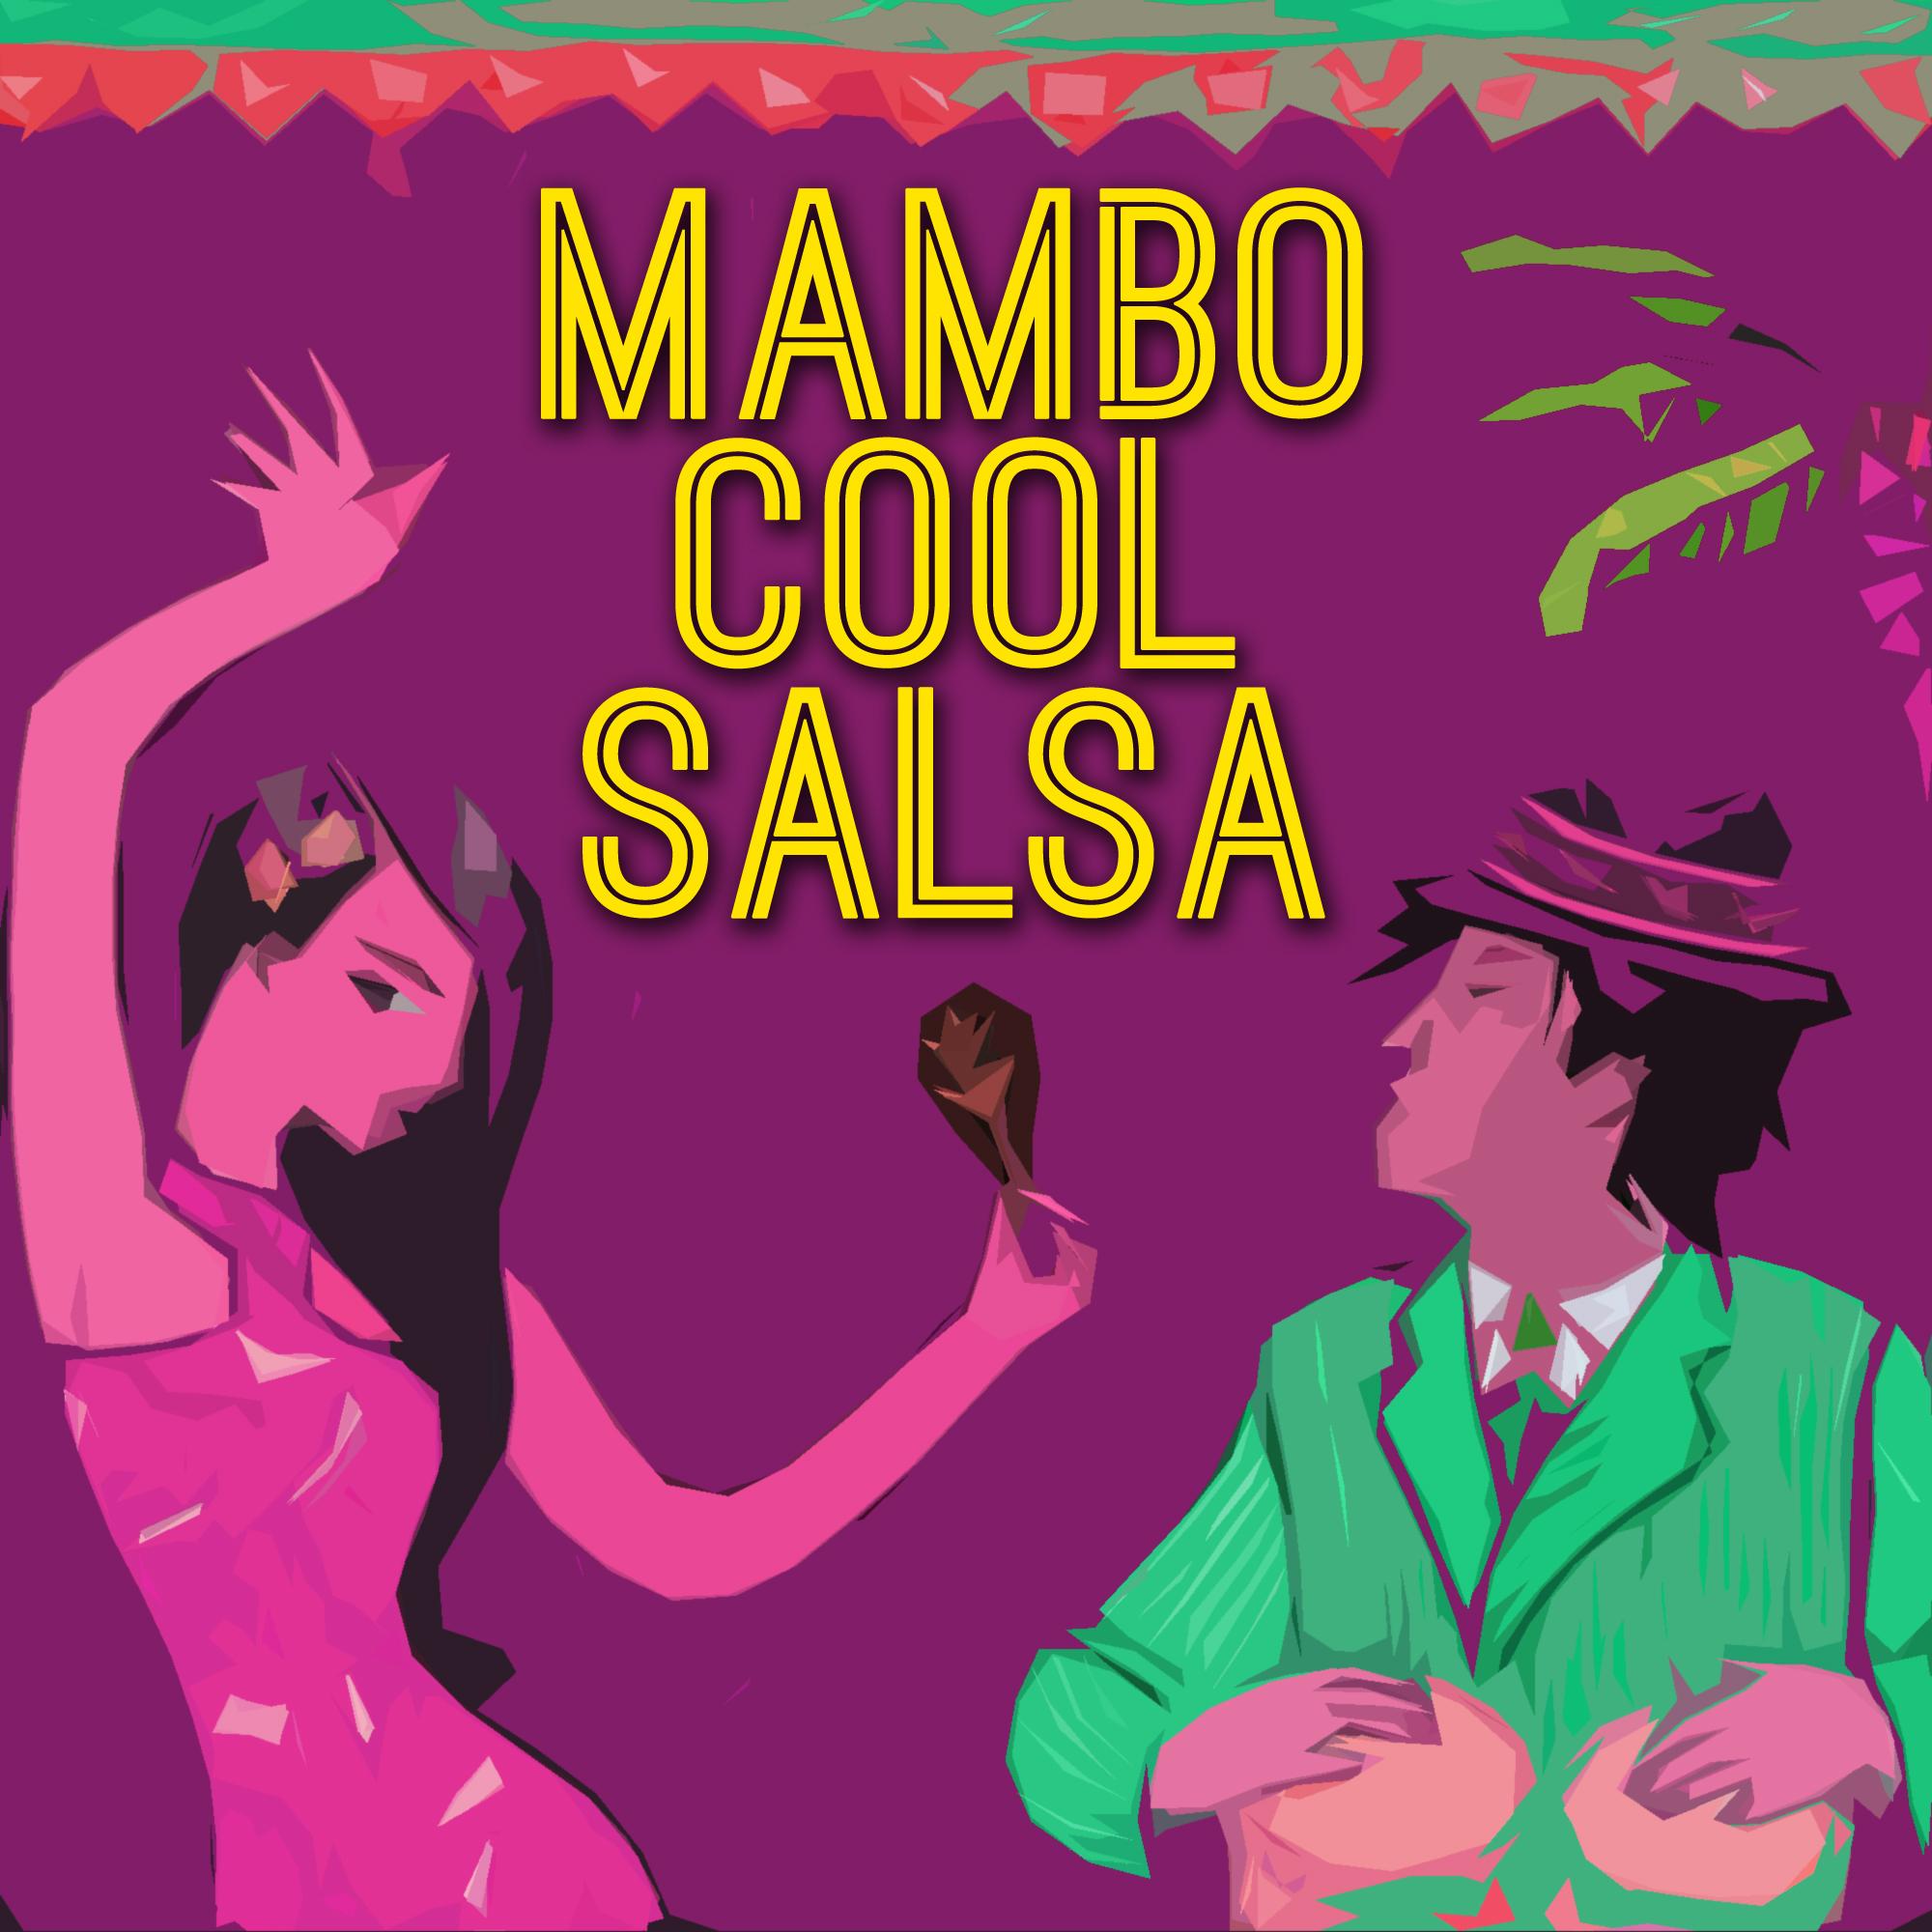 Mambo Cool Salsa